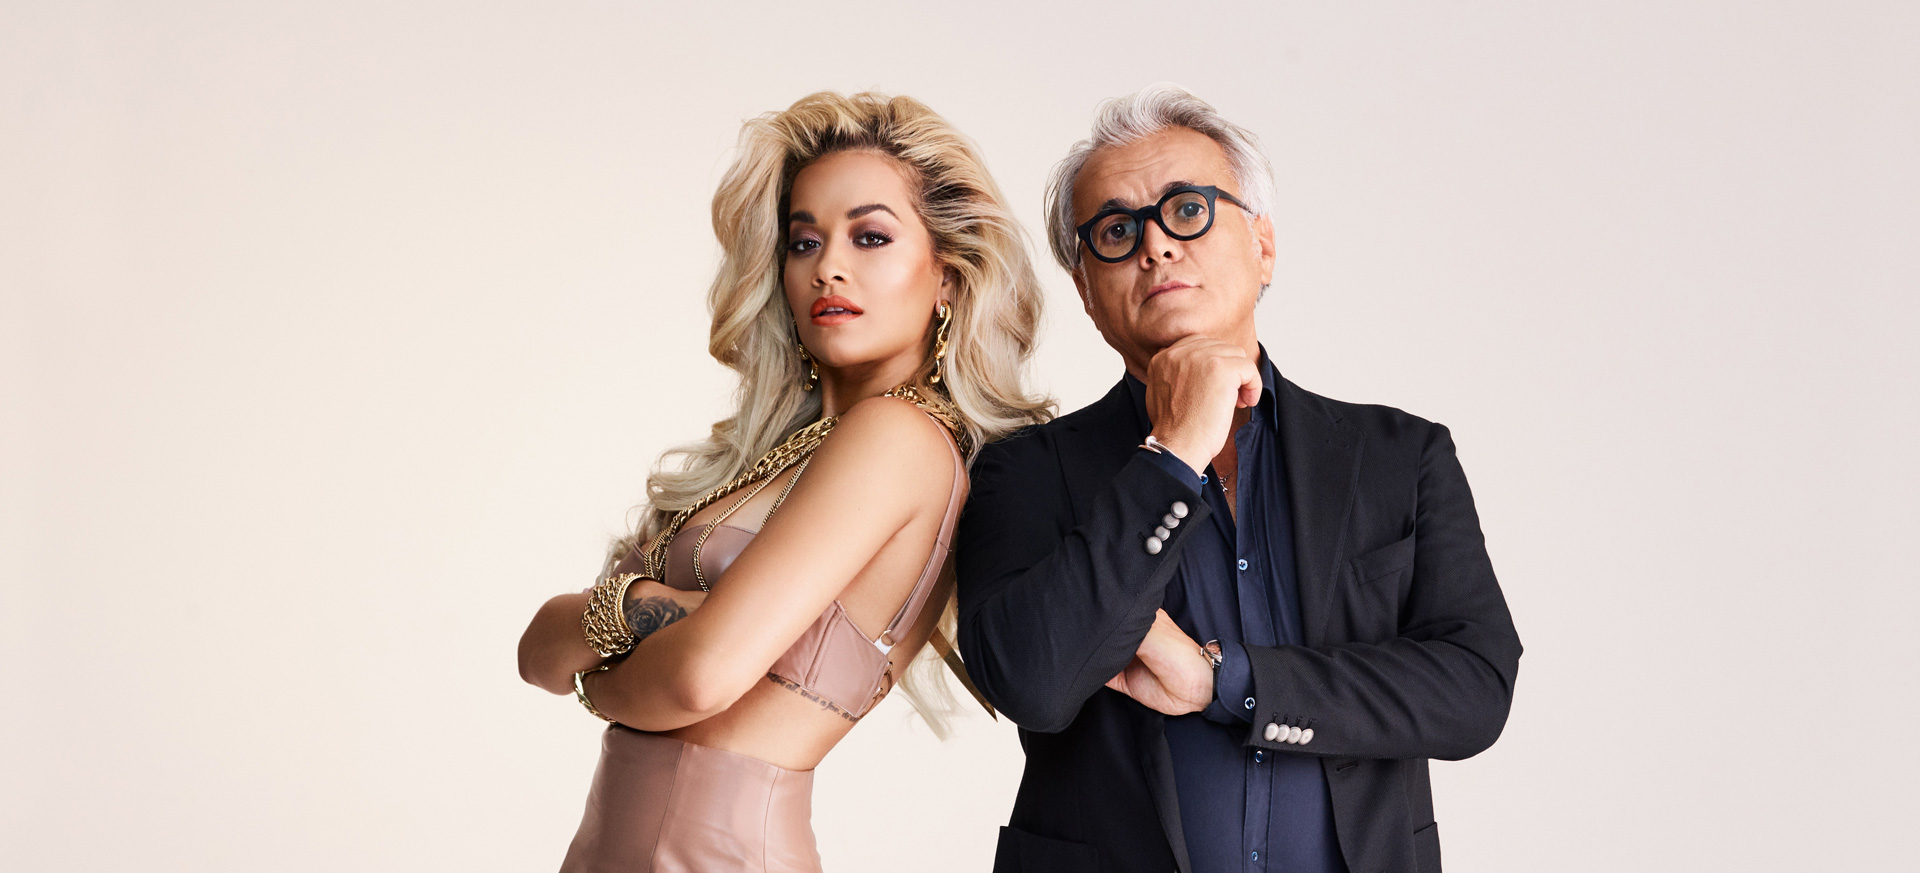 b98d6f34adb This is so HOT - Rita Ora X Giuseppe Zanotti shoe campaign - FLAVOURMAG